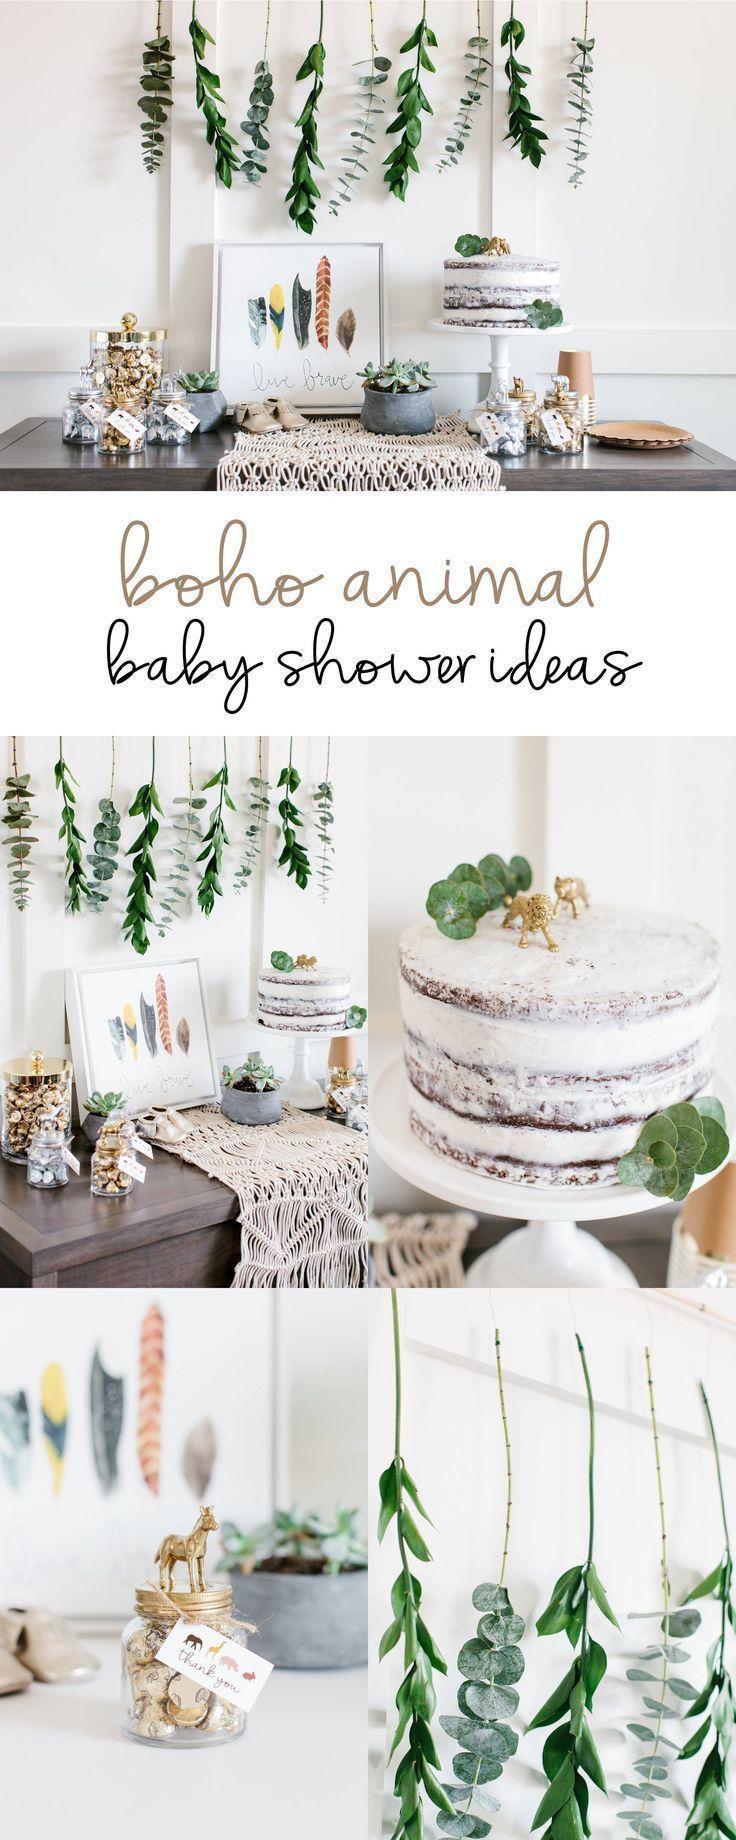 Boho Animal Baby Shower Ideas | Styled by The TomKat Studio #babyshowerideas